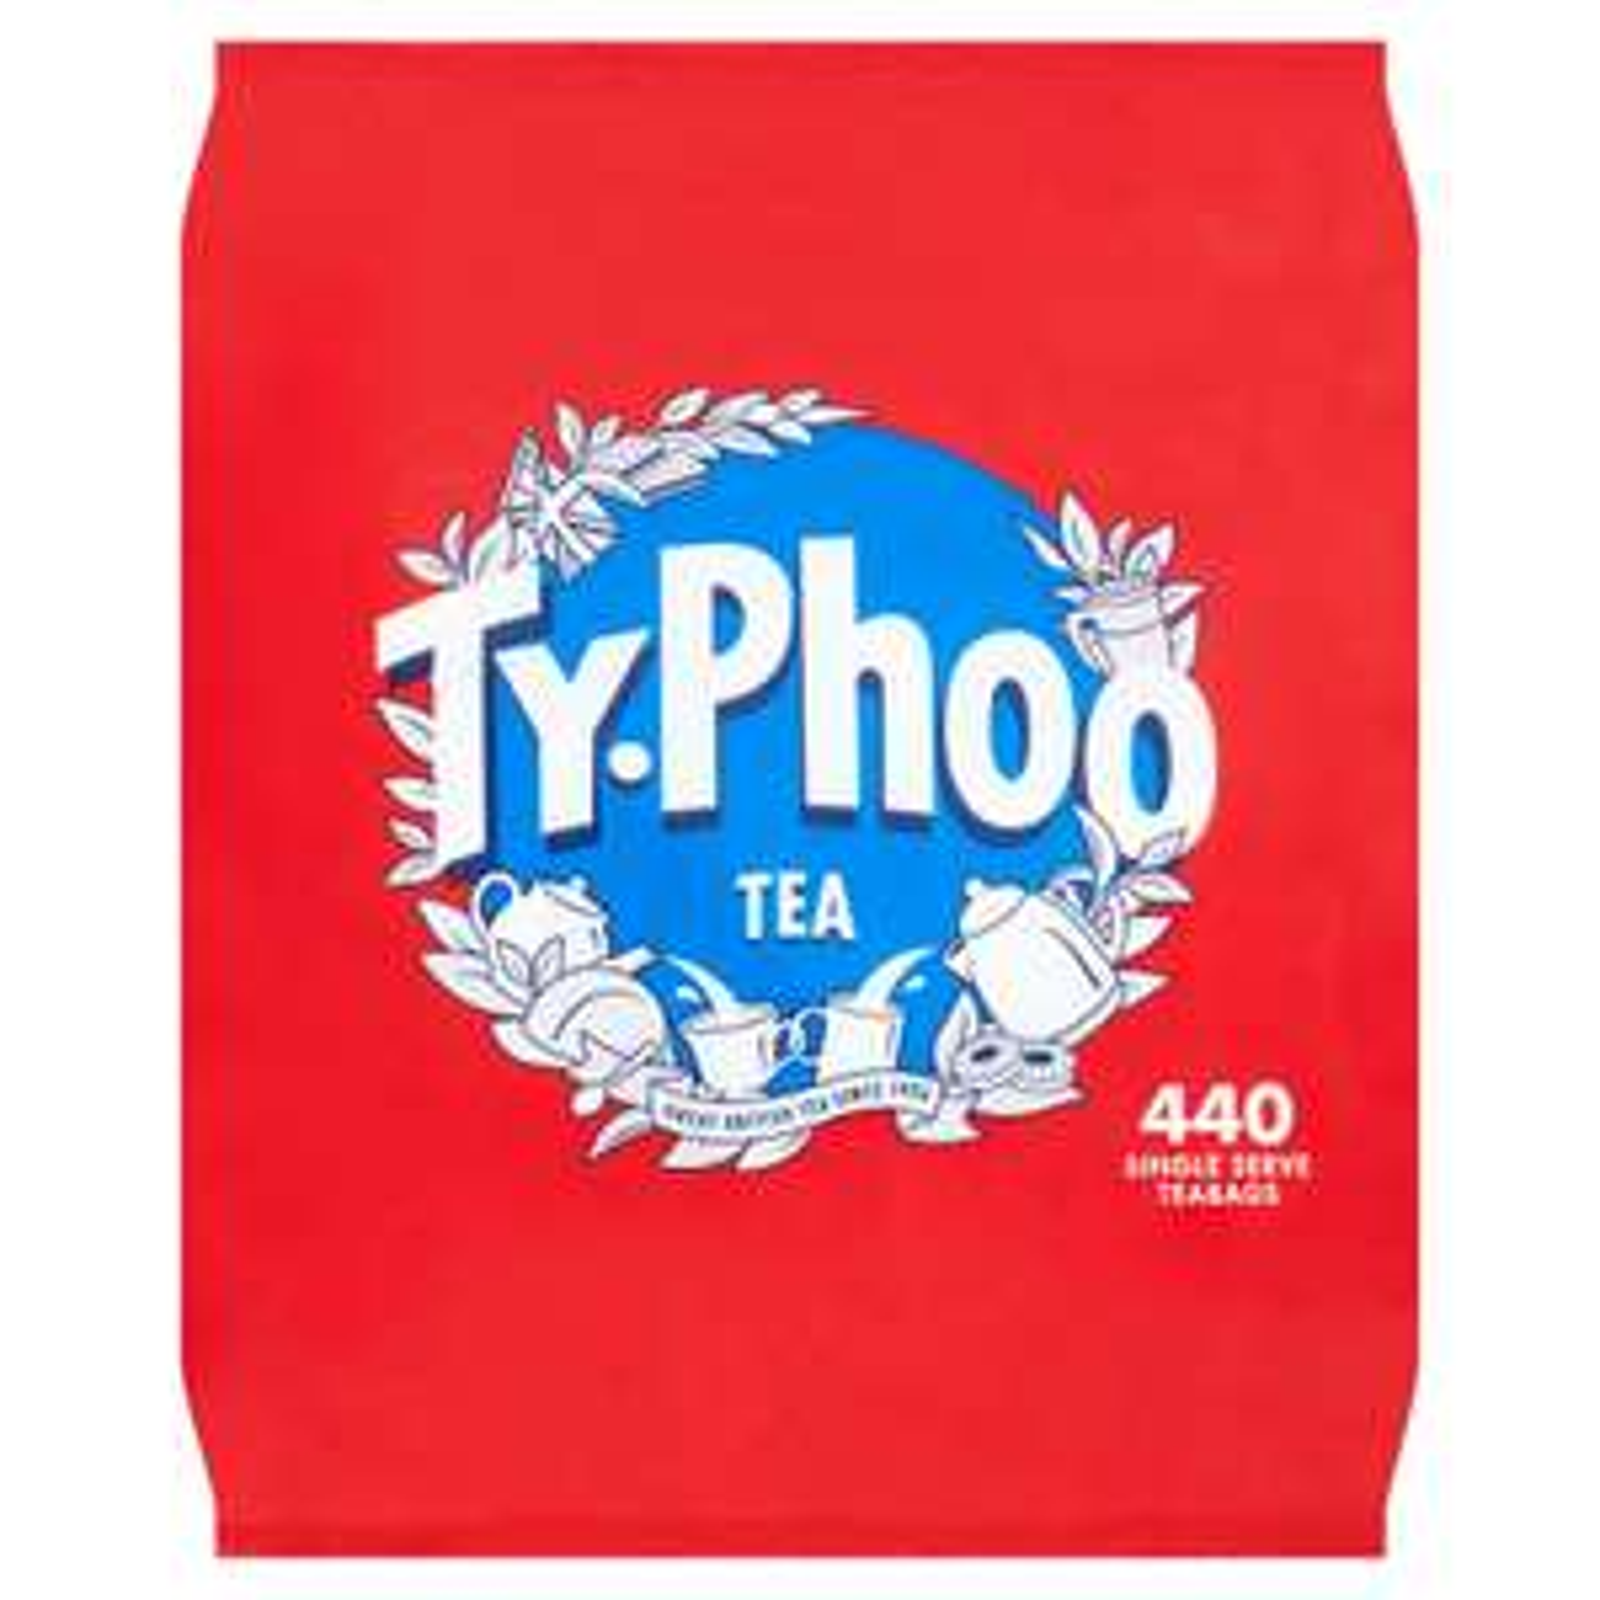 Typhoo teabags 440pk Instore only - £2.25 @ ASDA